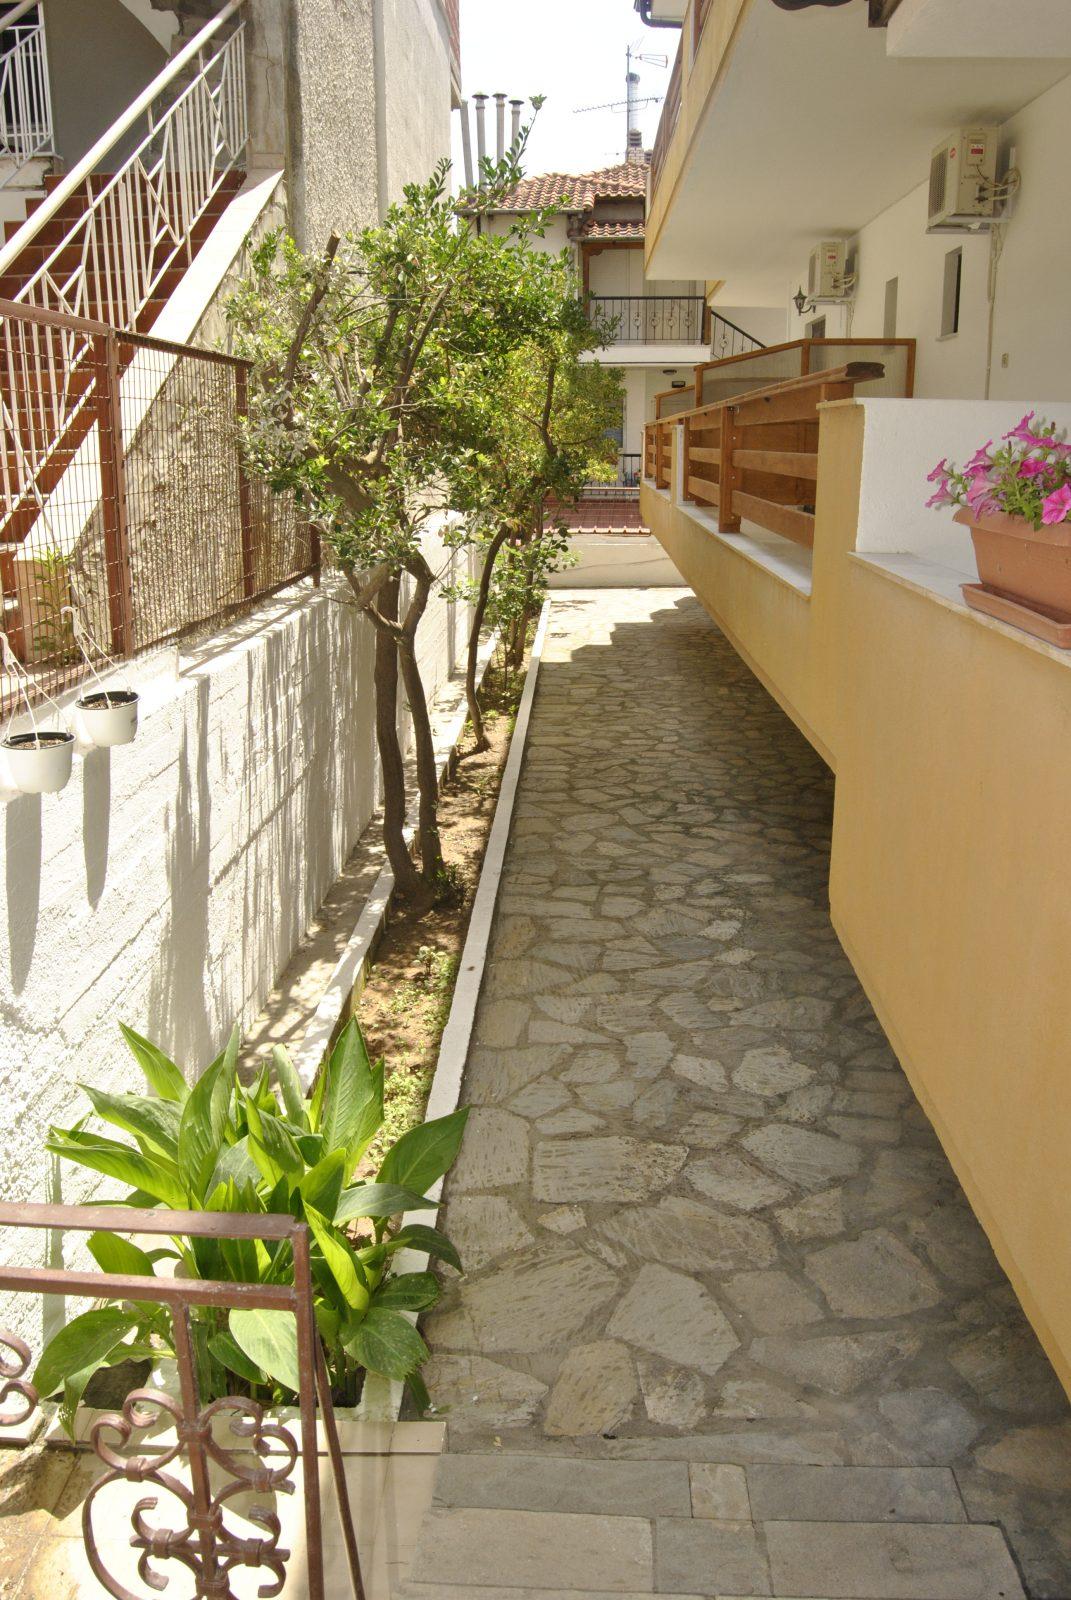 Grcka apartmani letovanje, Nea Flogita Halkidiki, Pirgioti, prostor oko kuće